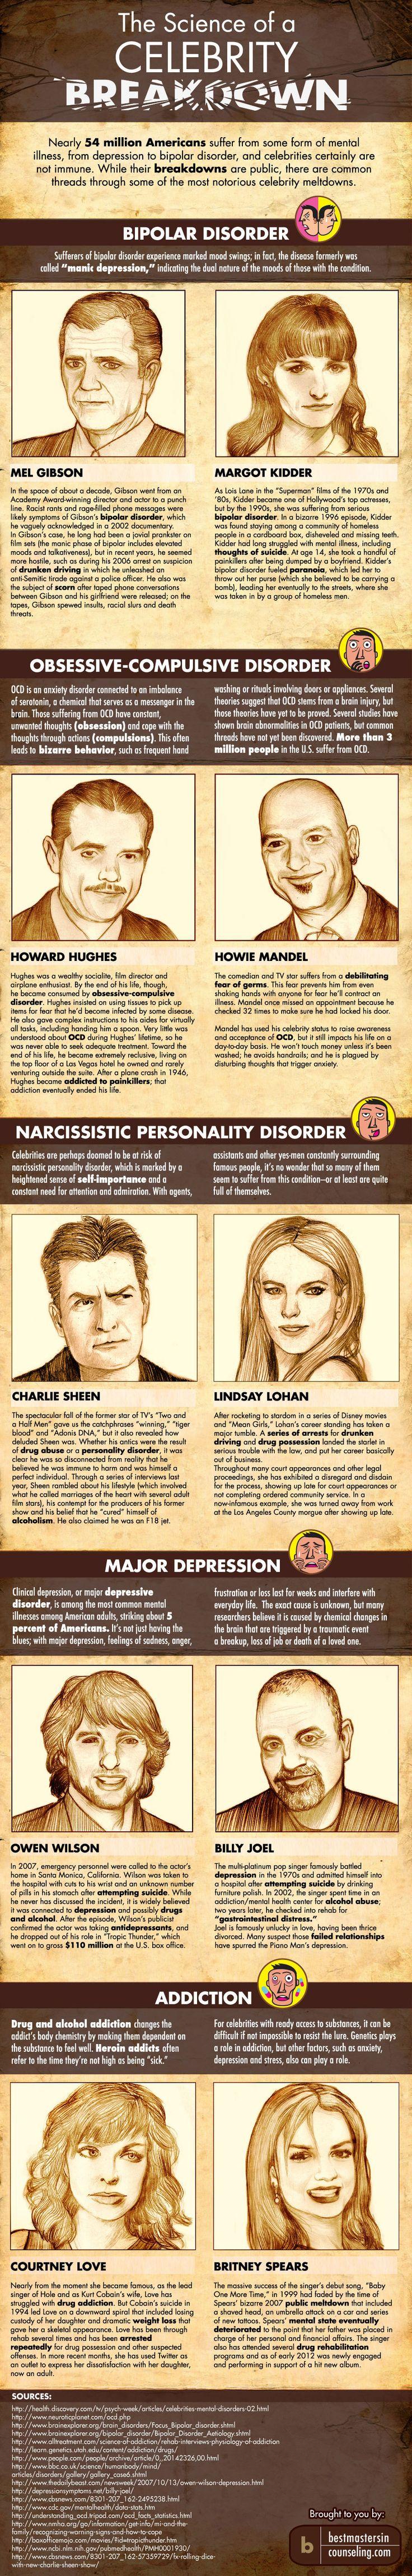 Struggled with Mental Illness - Biography